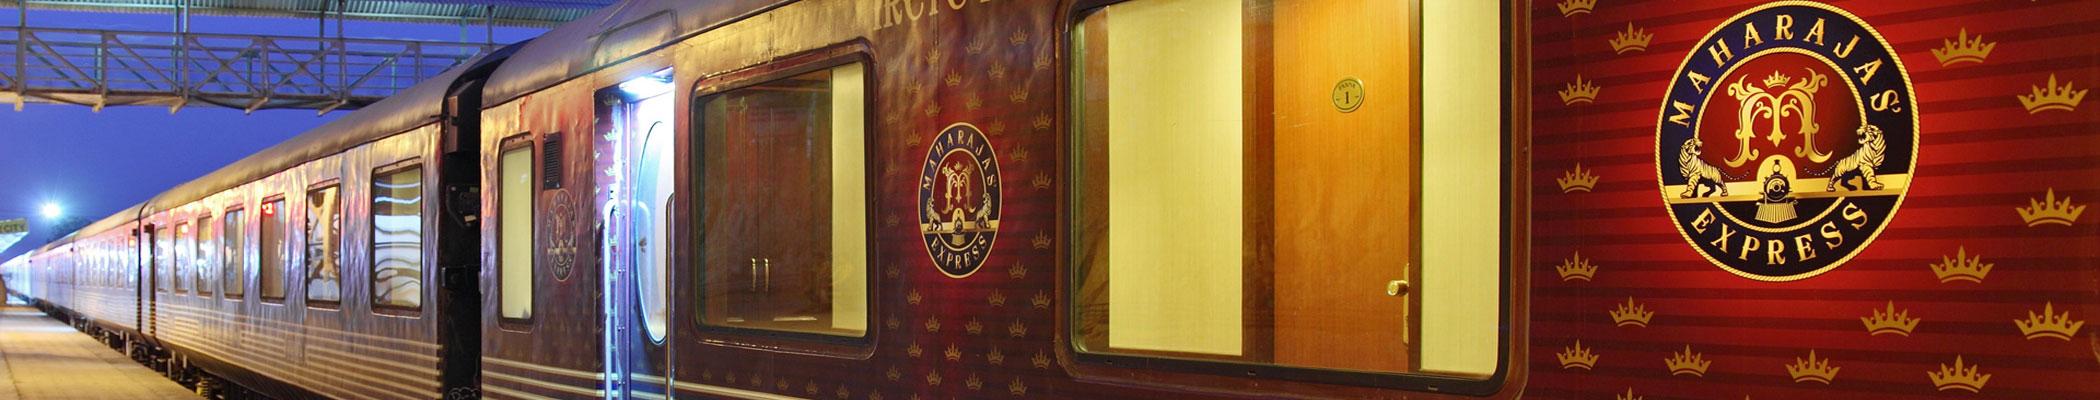 maharajas u0027 express luxury train travel in india